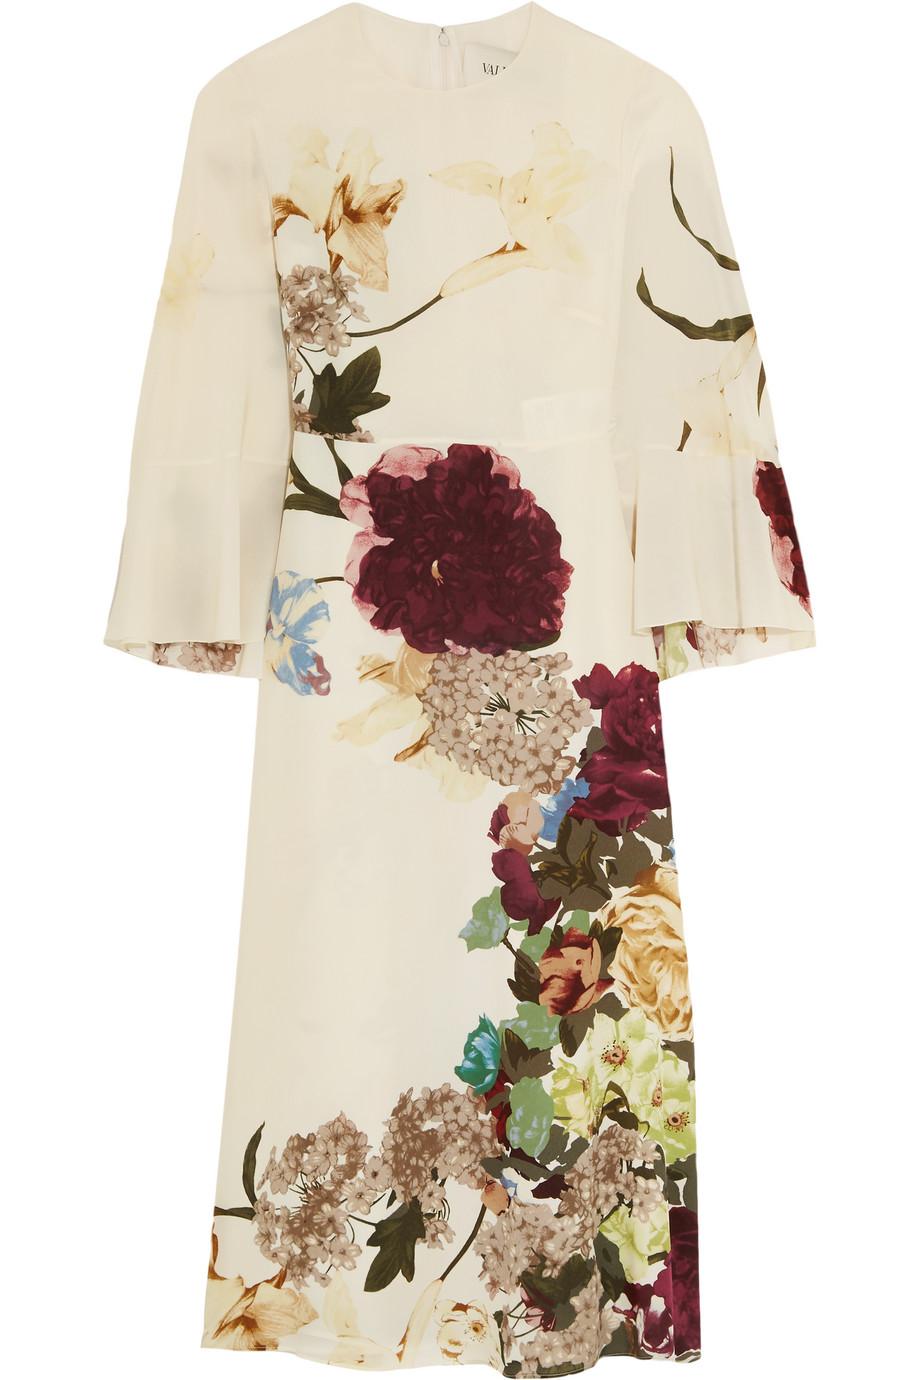 Valentino Cape-Back Floral-Print Silk Midi Dress, Ivory/Burgundy, Women's - floral print, Size: 42